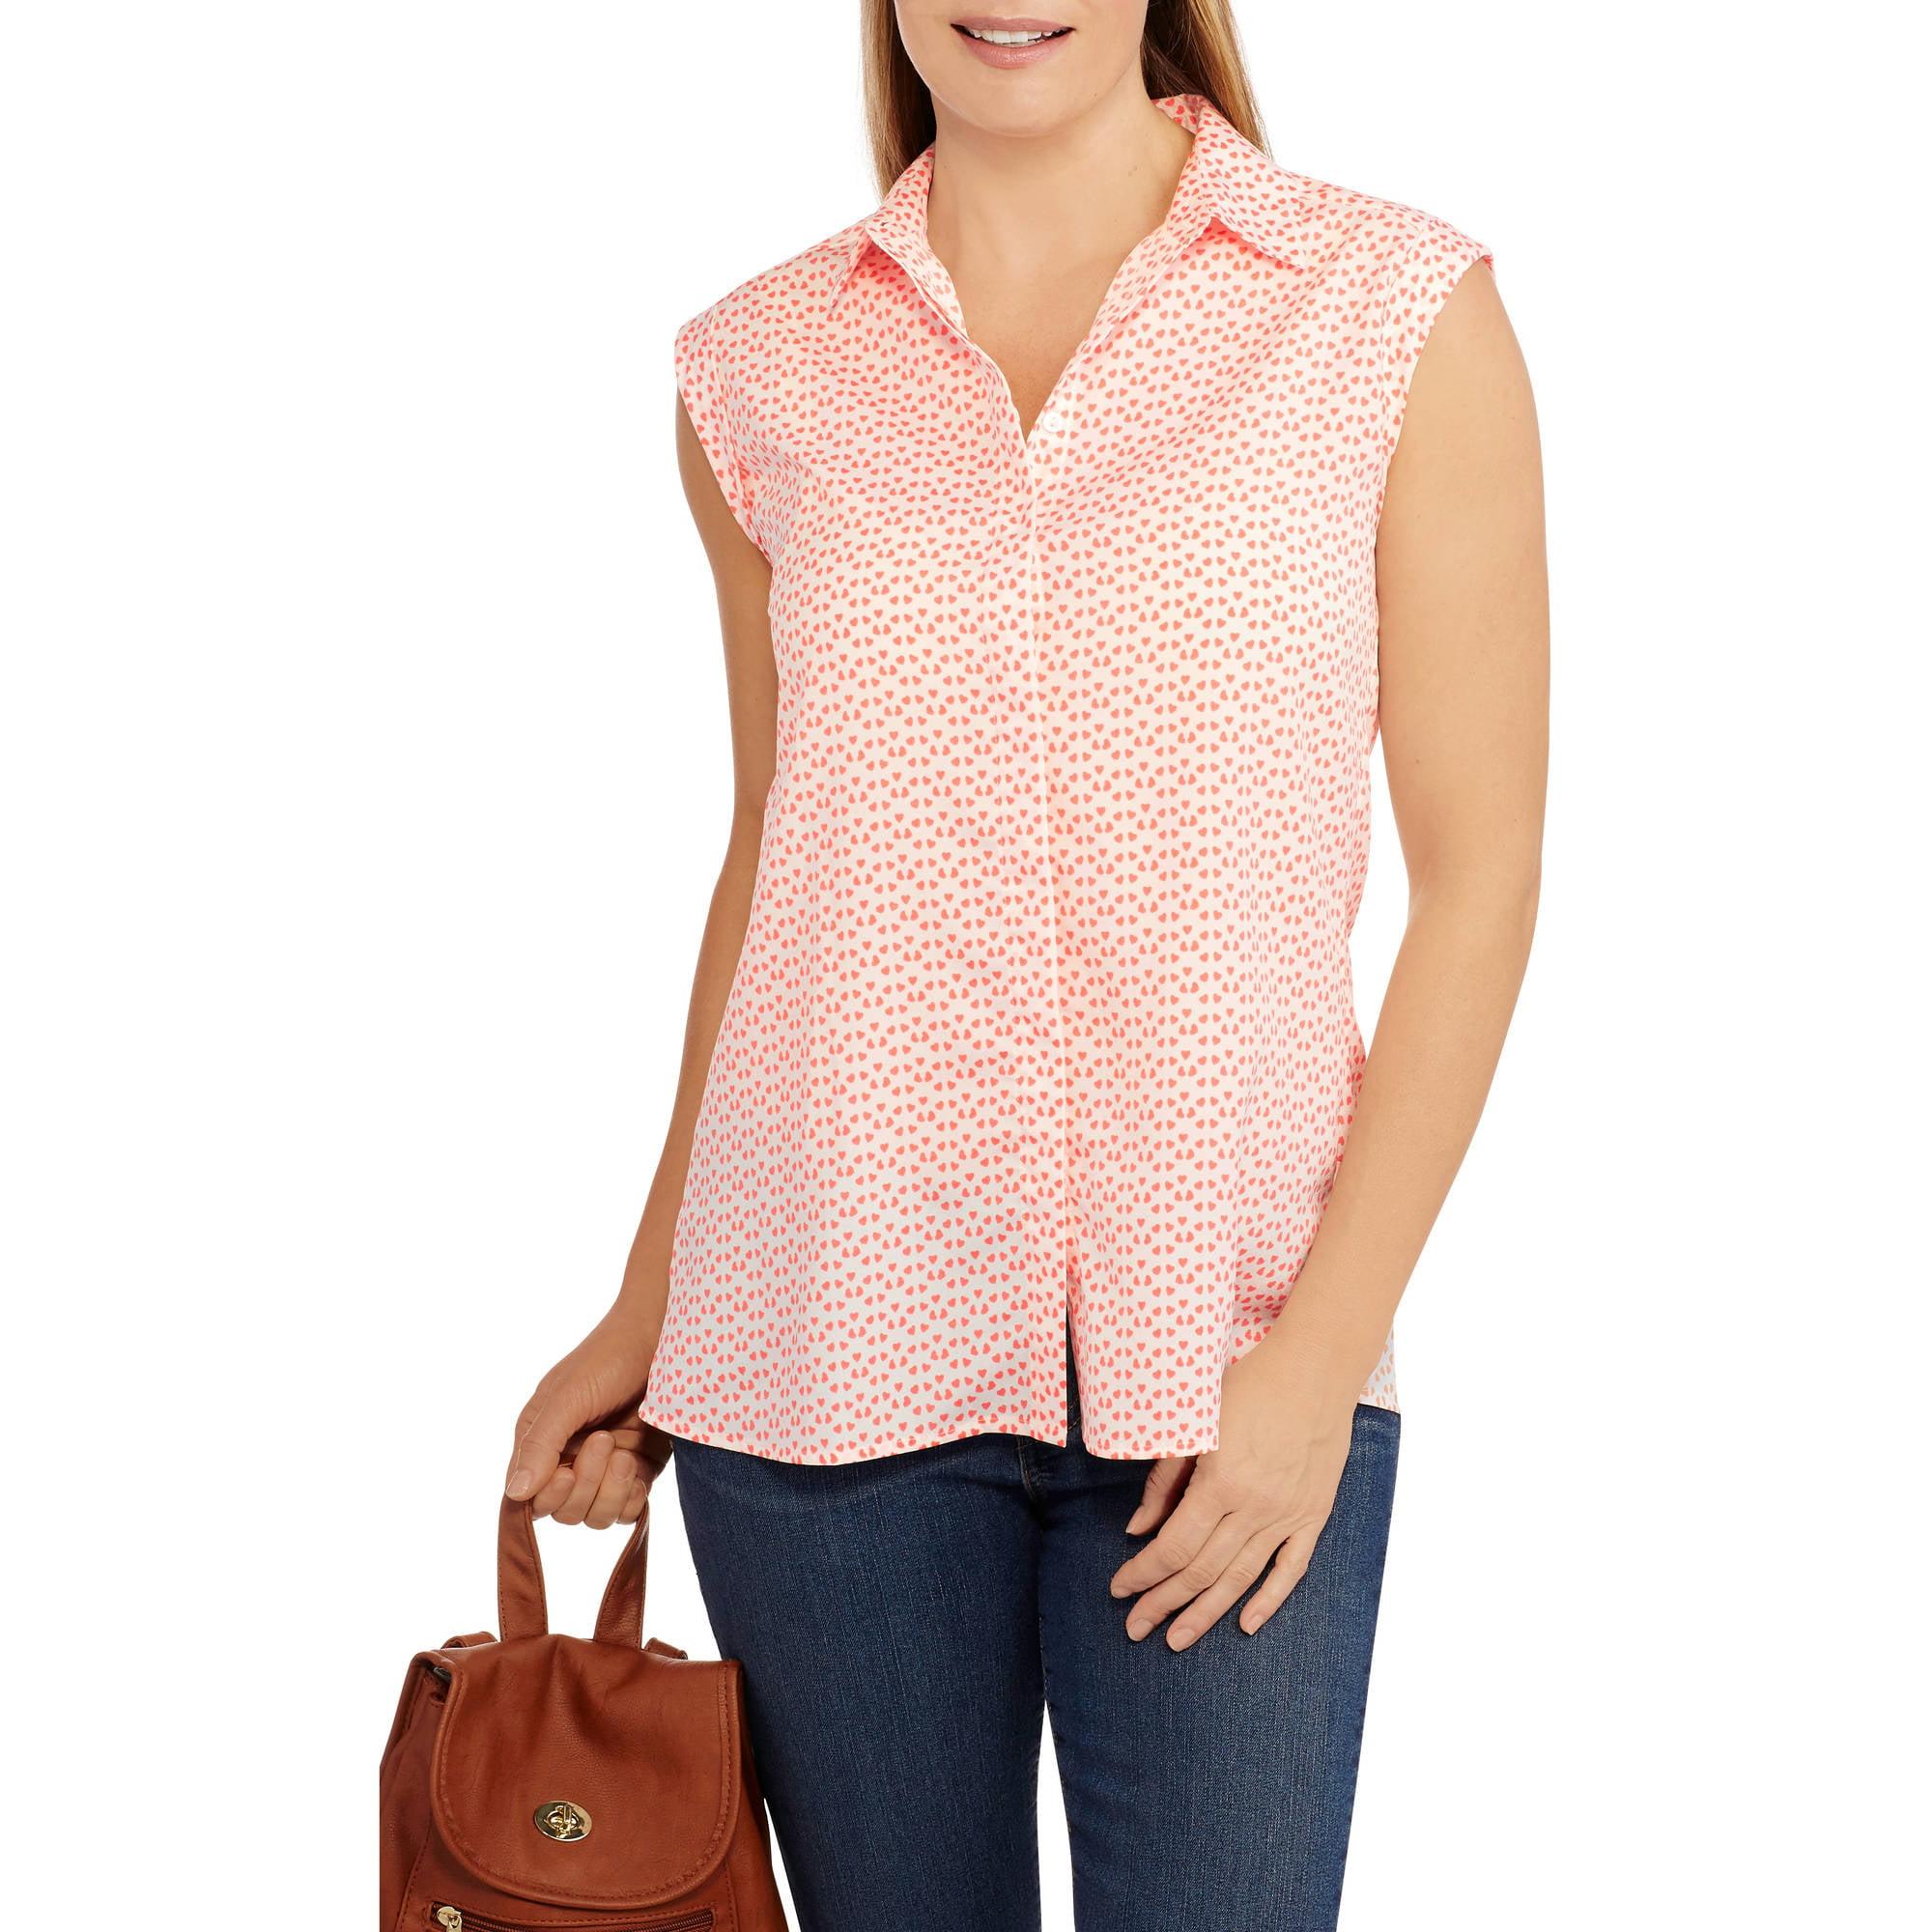 Millennium Women's Printed Cap Sleeve Collared Blouse